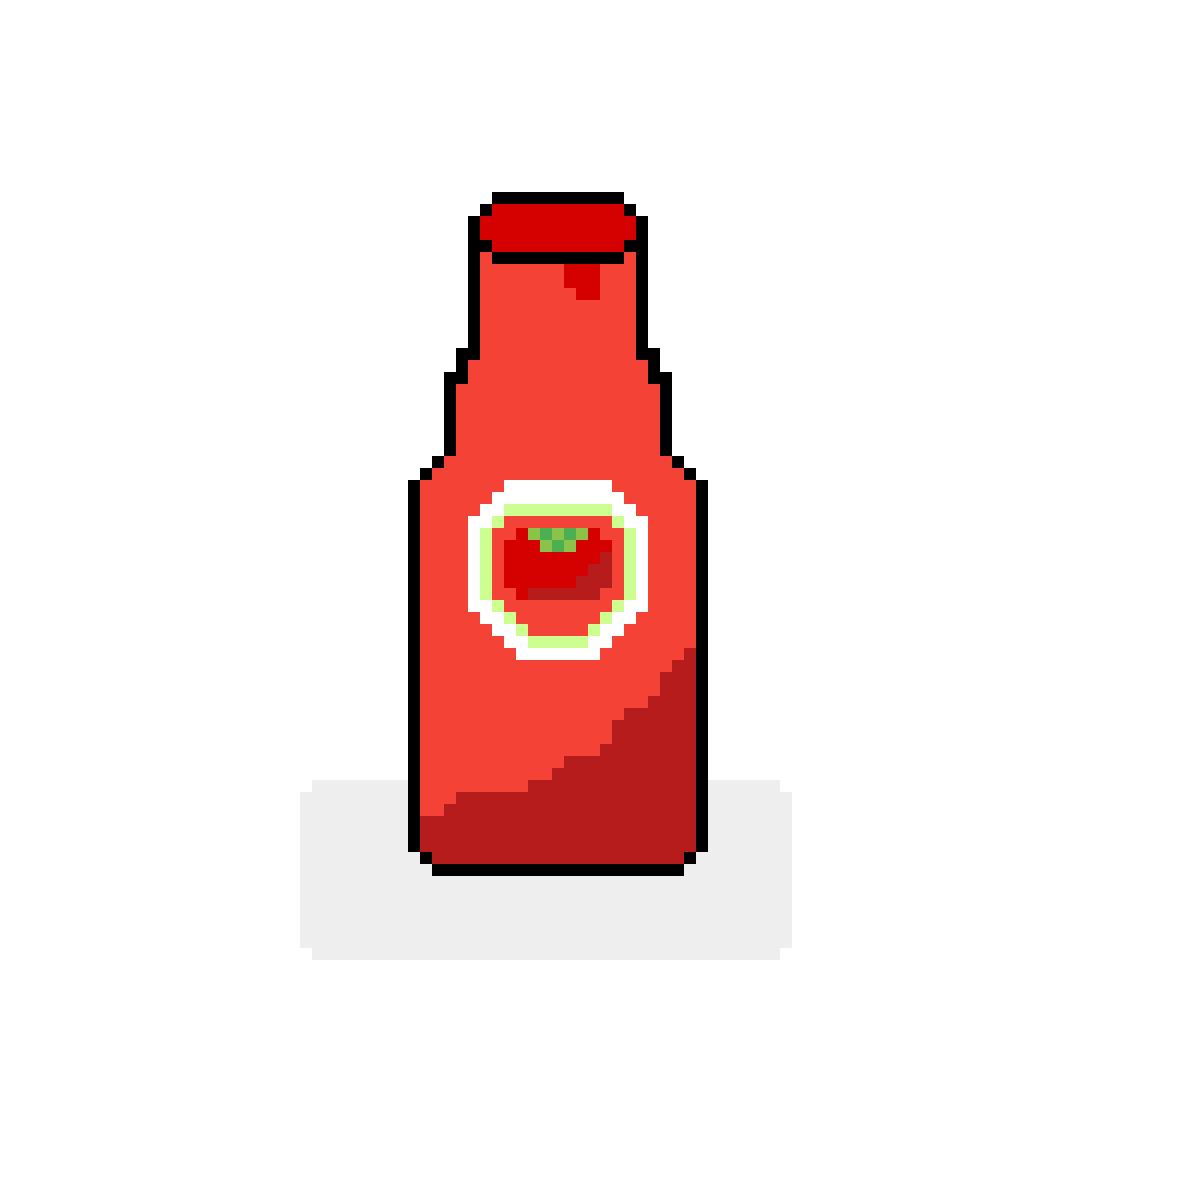 Ketchup by TheWildPikachu